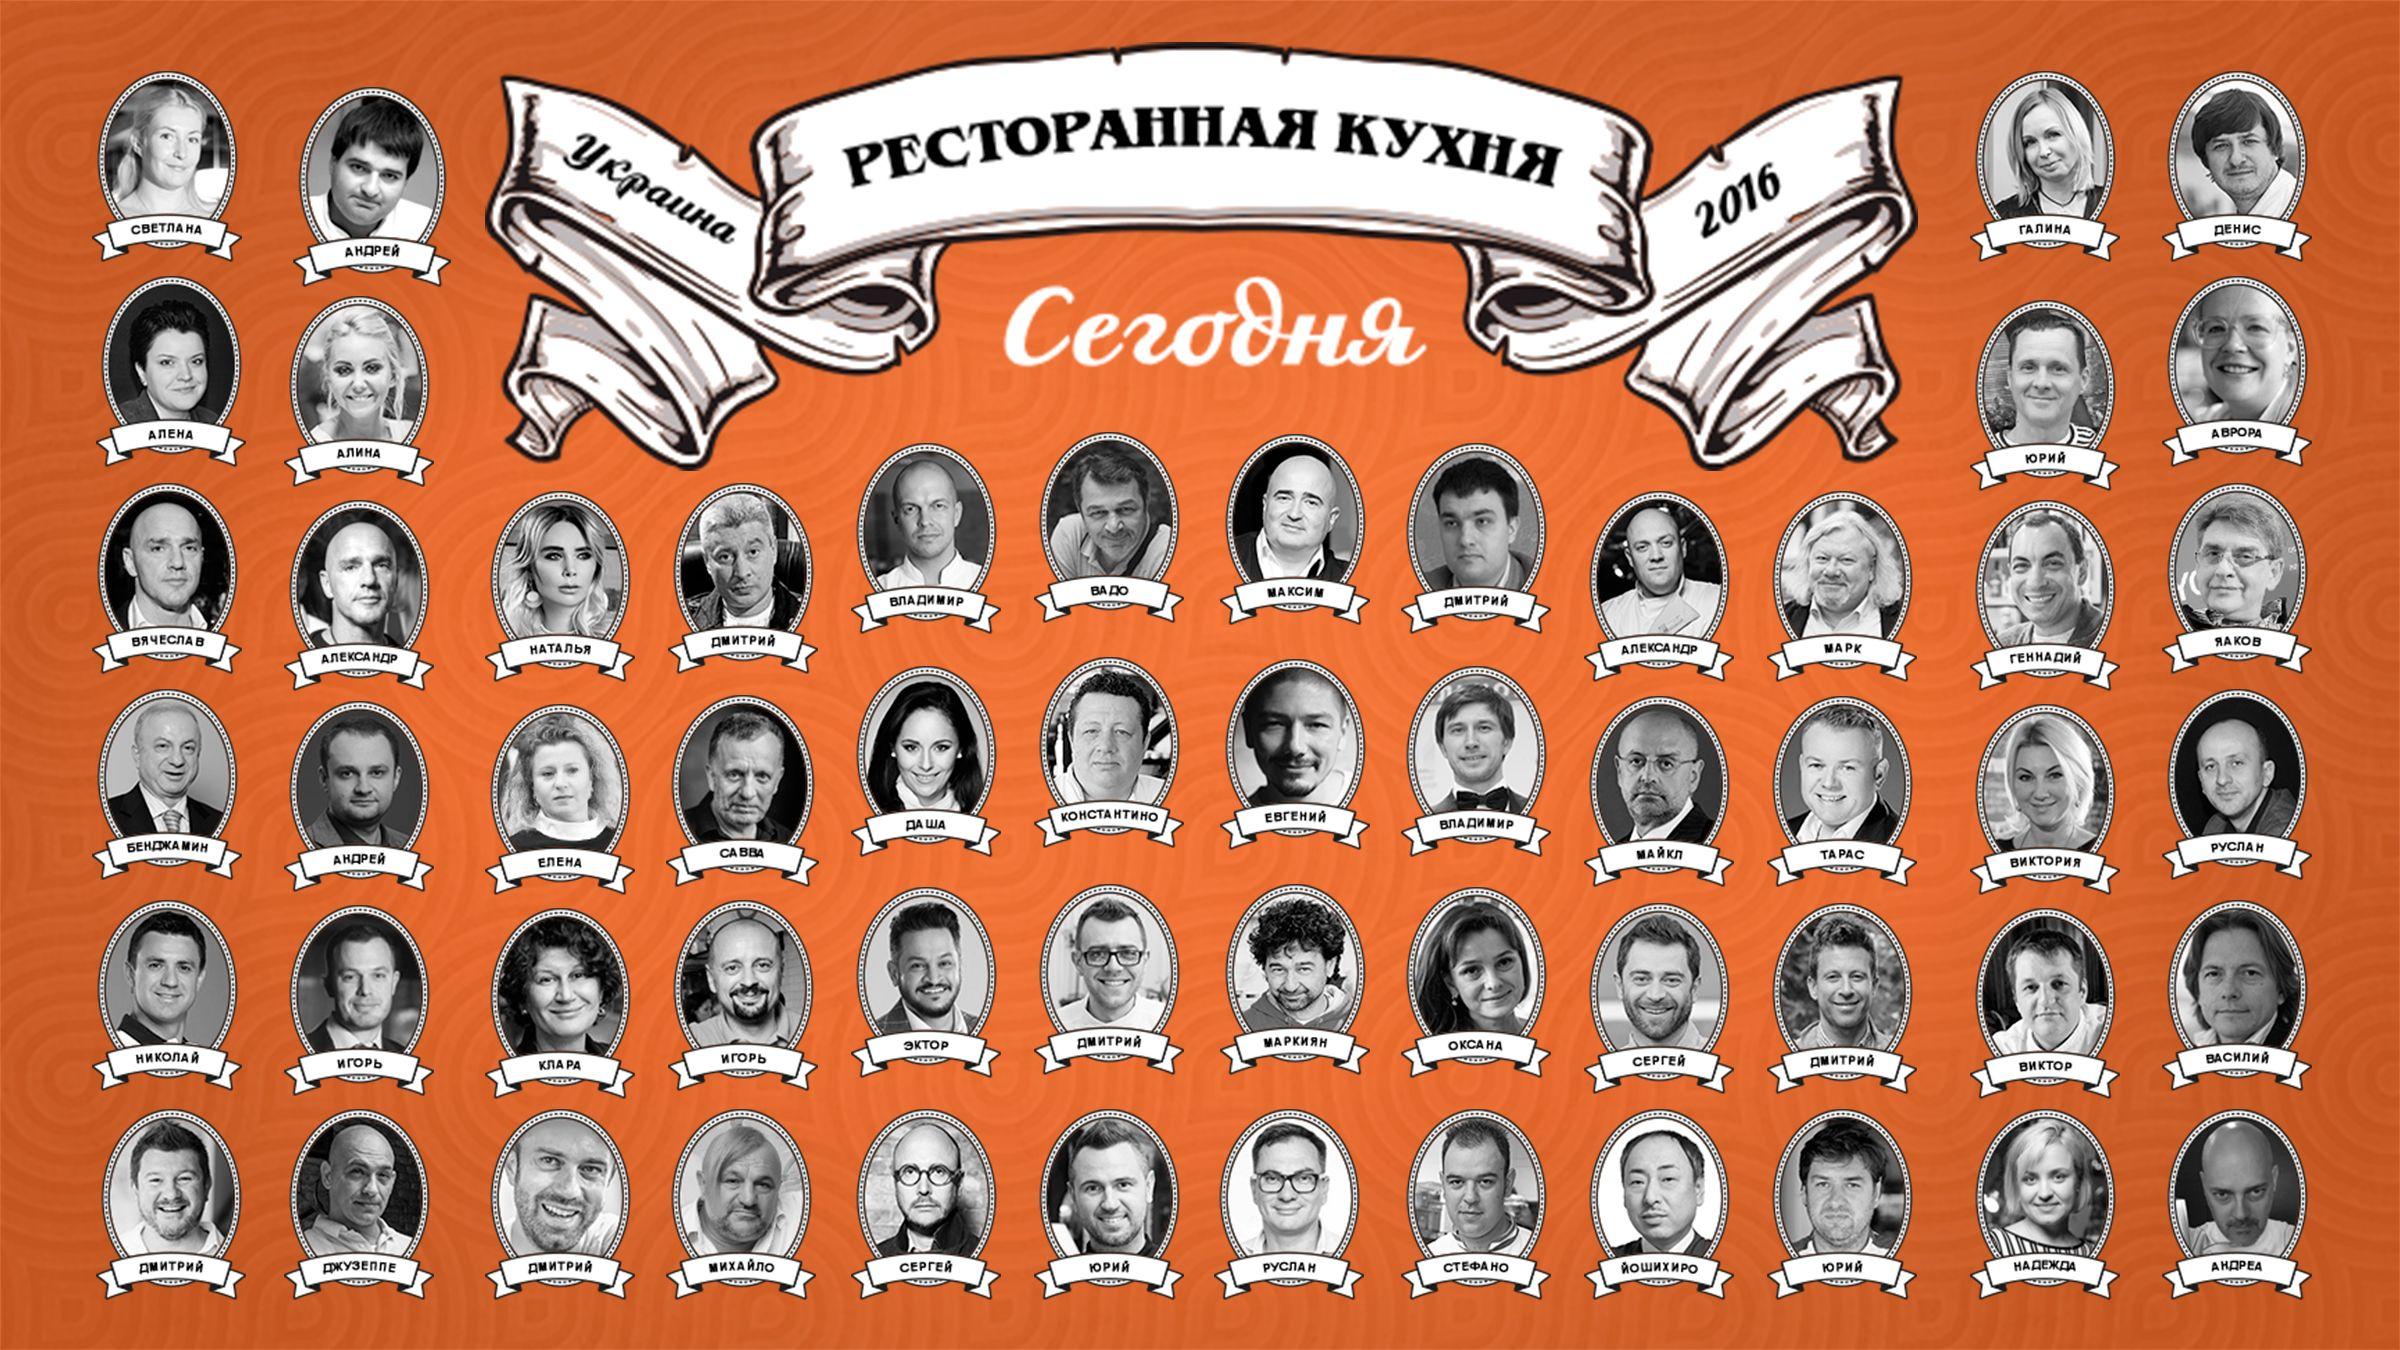 Creative Chefs Summit Kyiv 2016. Украинская кухня: вчера, сегодня, завтра.